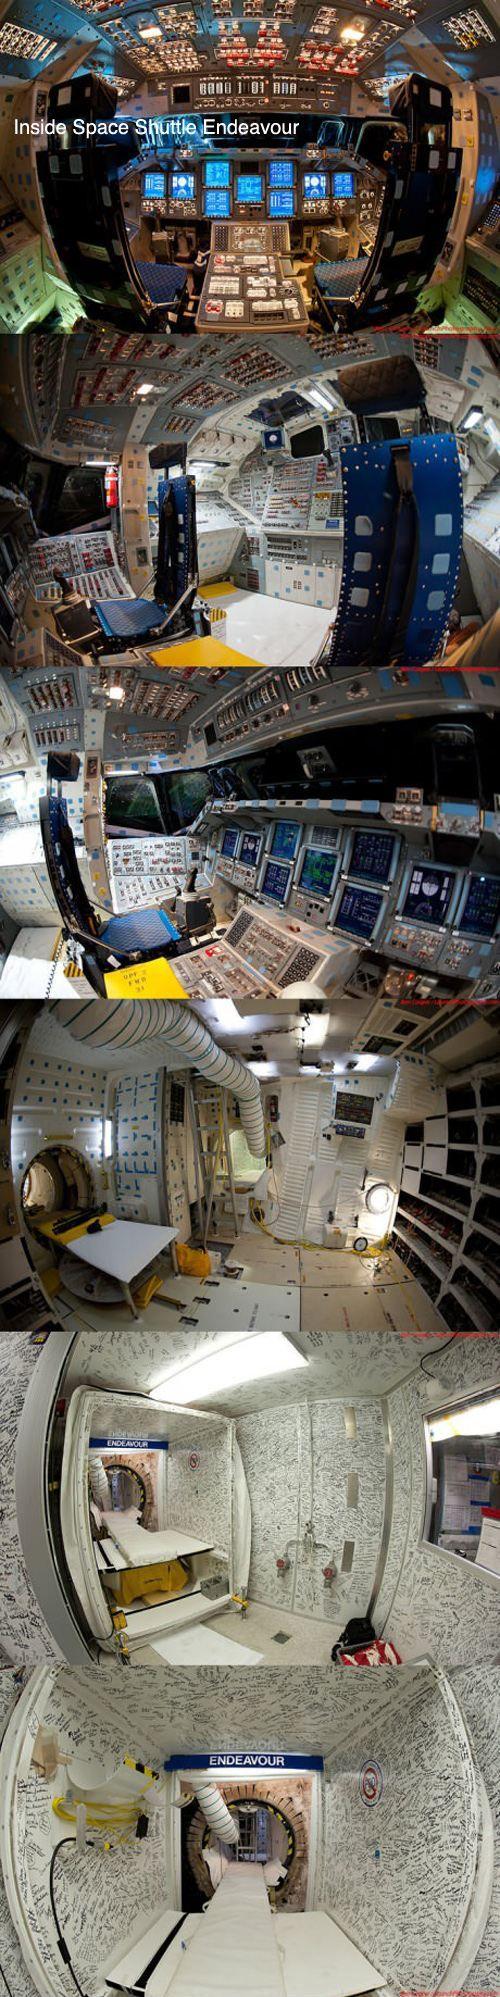 Inside Space Shuttle Endeavour